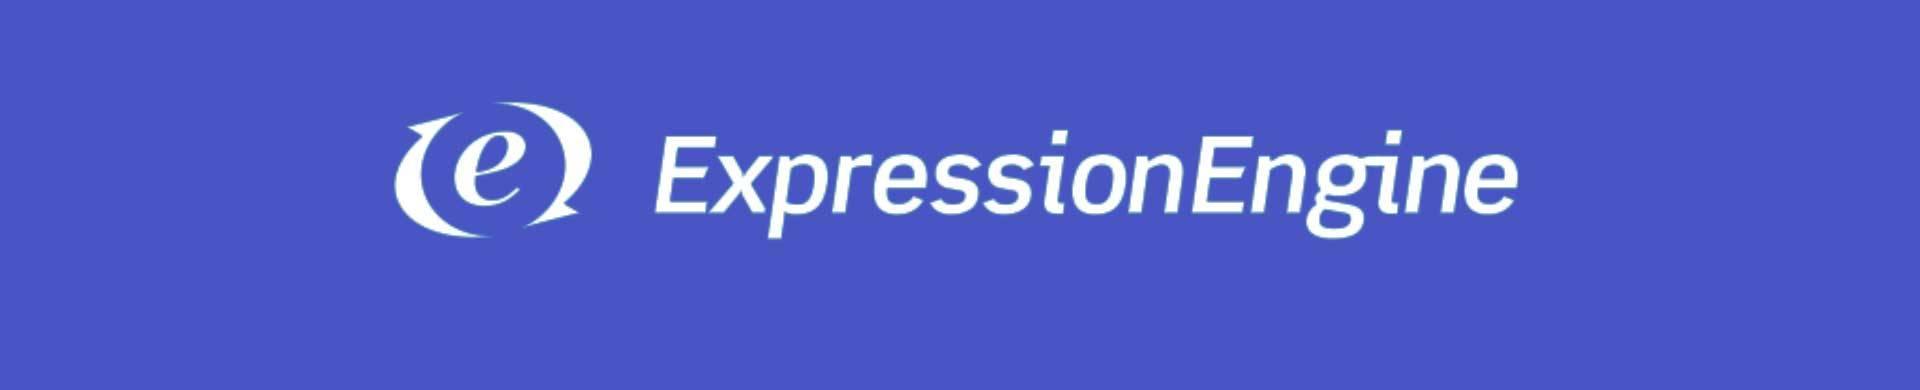 Expert ExpressionEngine Website Design and Support